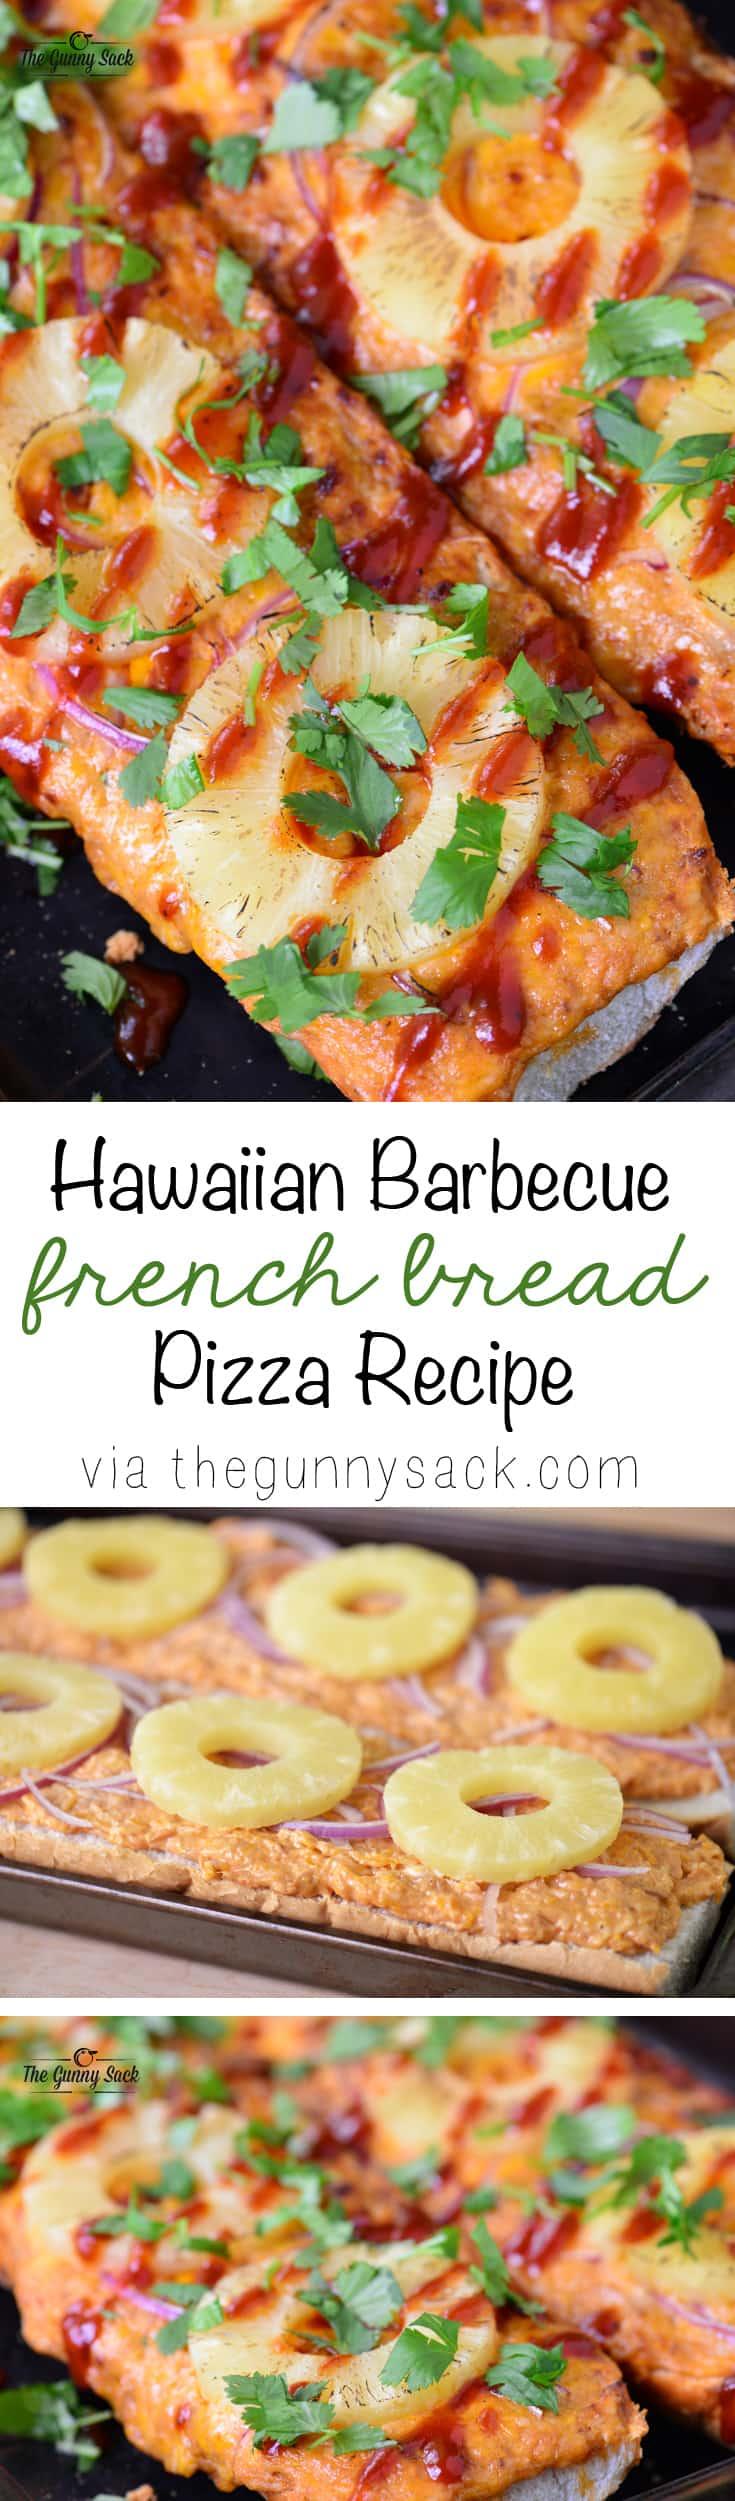 Hawaiian_Barbecue_French_Bread_Pizza